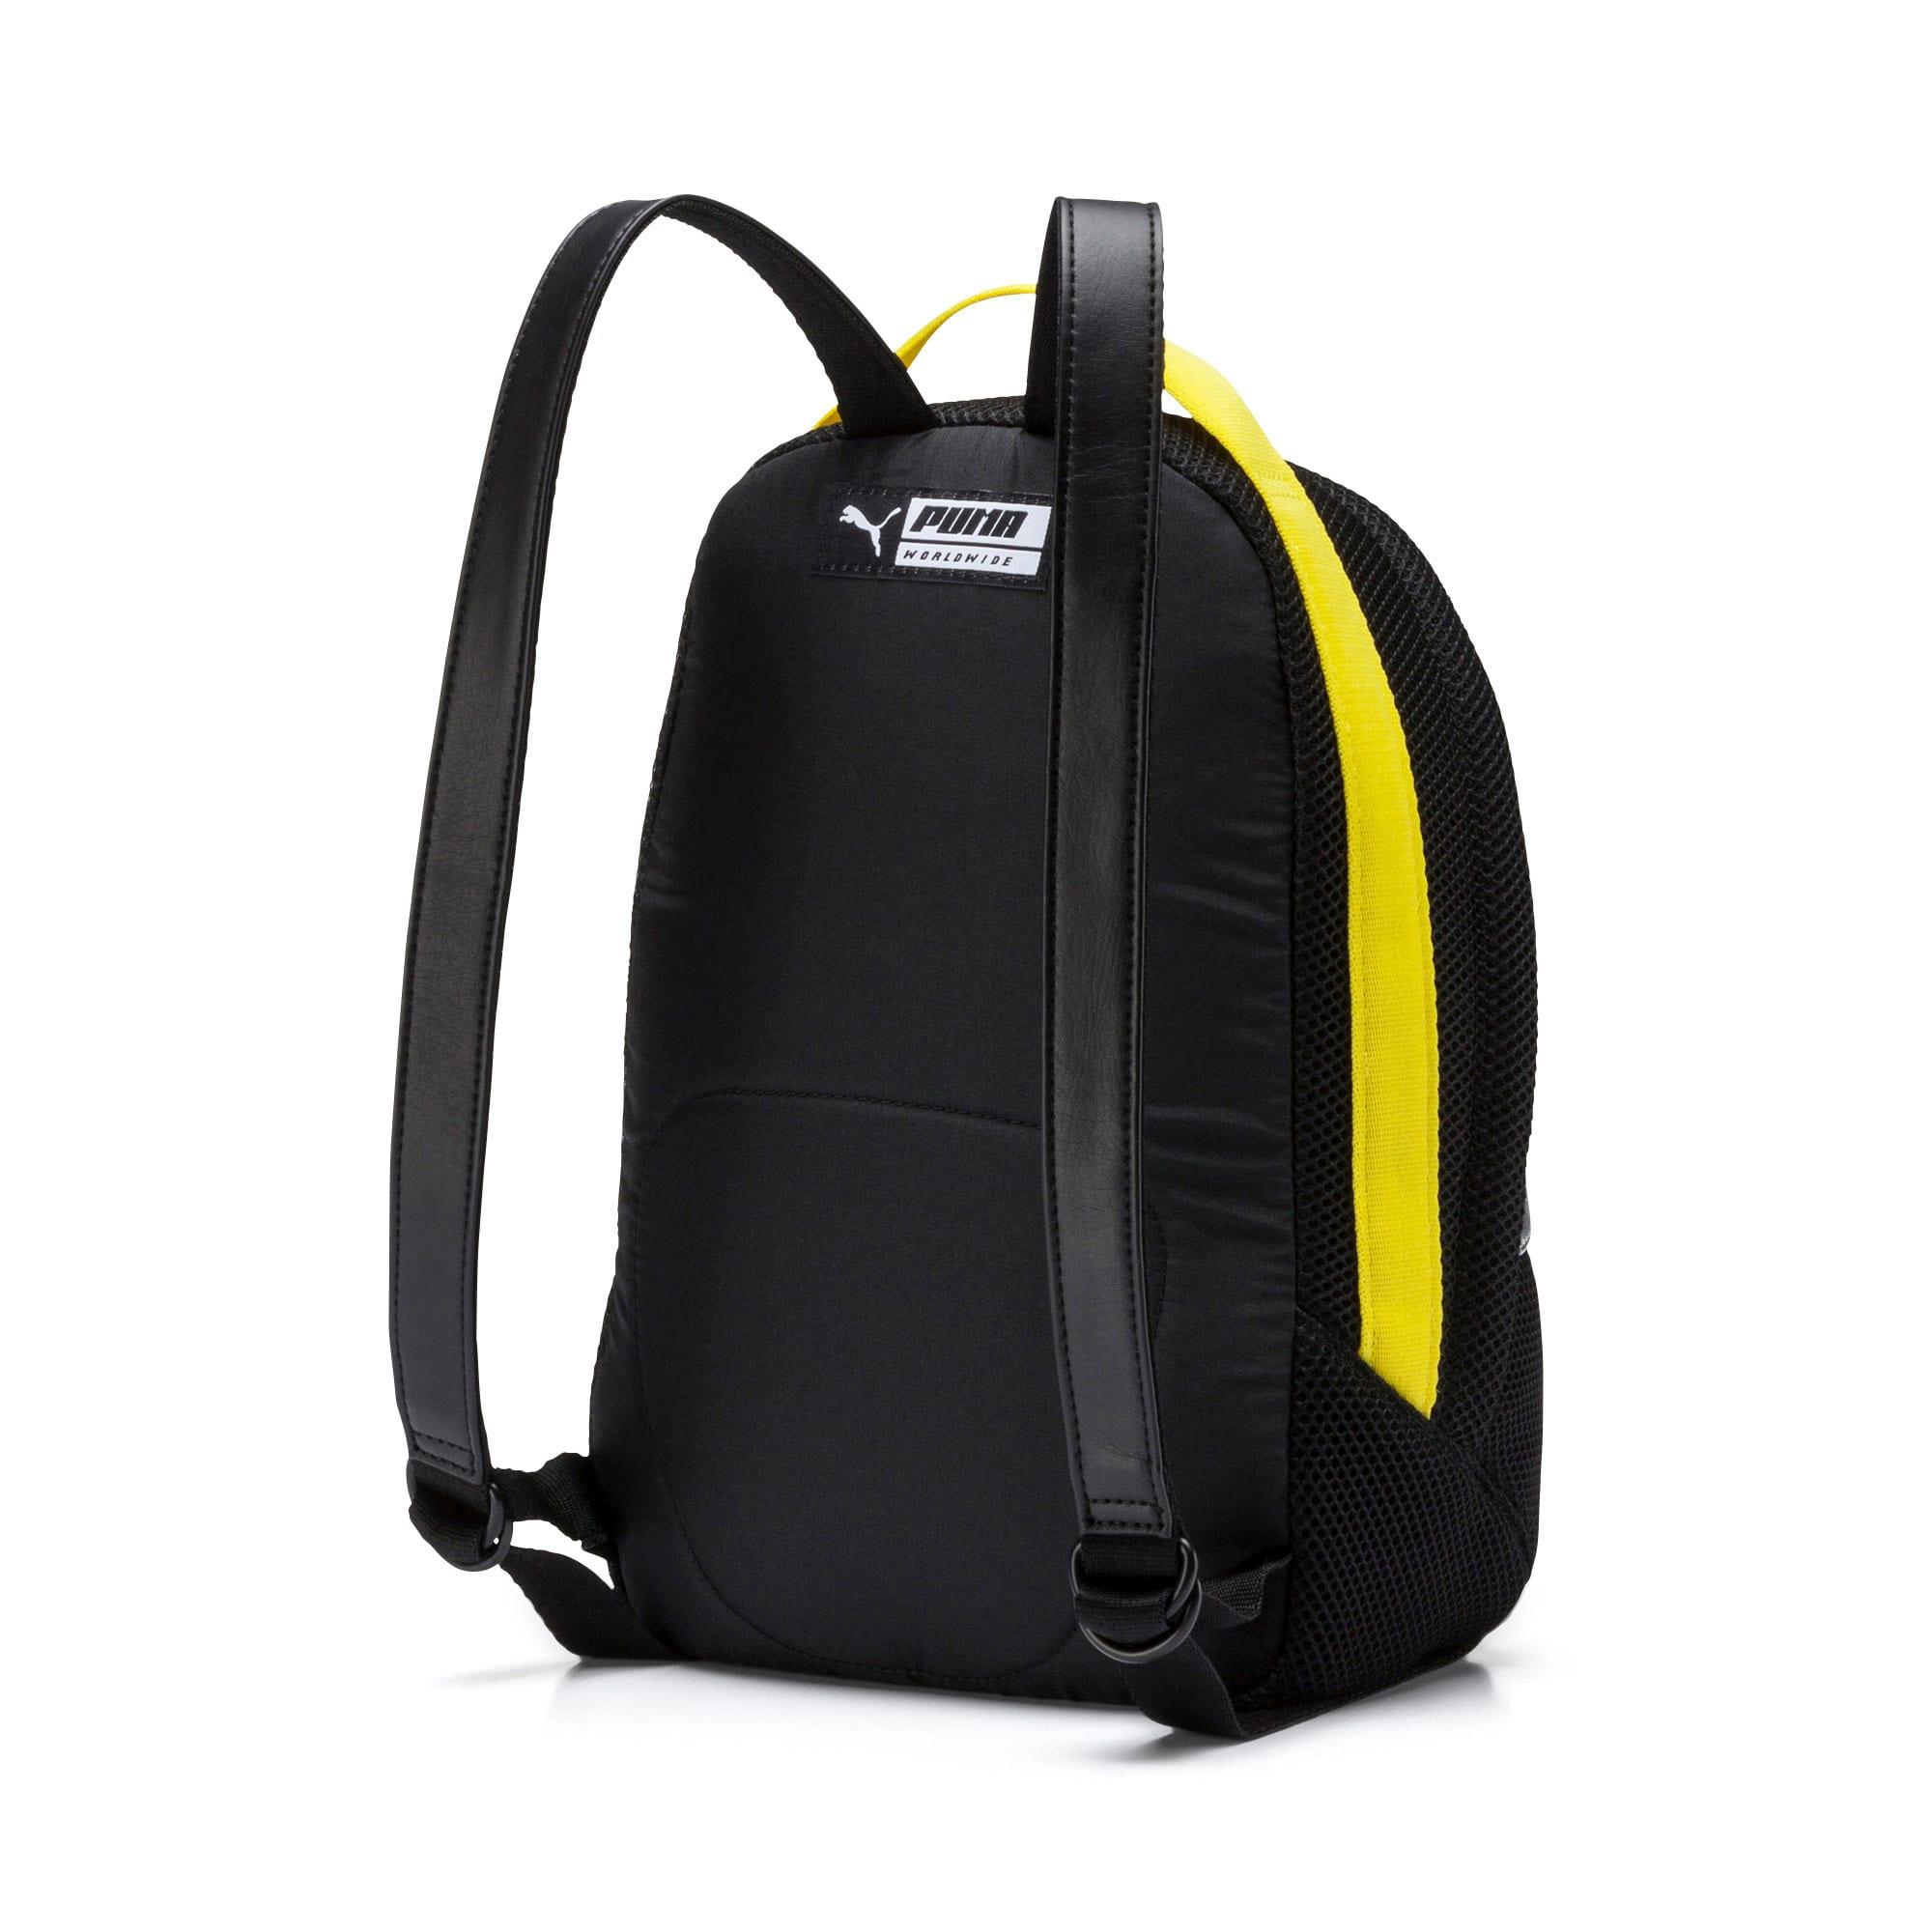 Thumbnail 3 of Women's Street Backpack, Puma Black-Blazing Yellow, medium